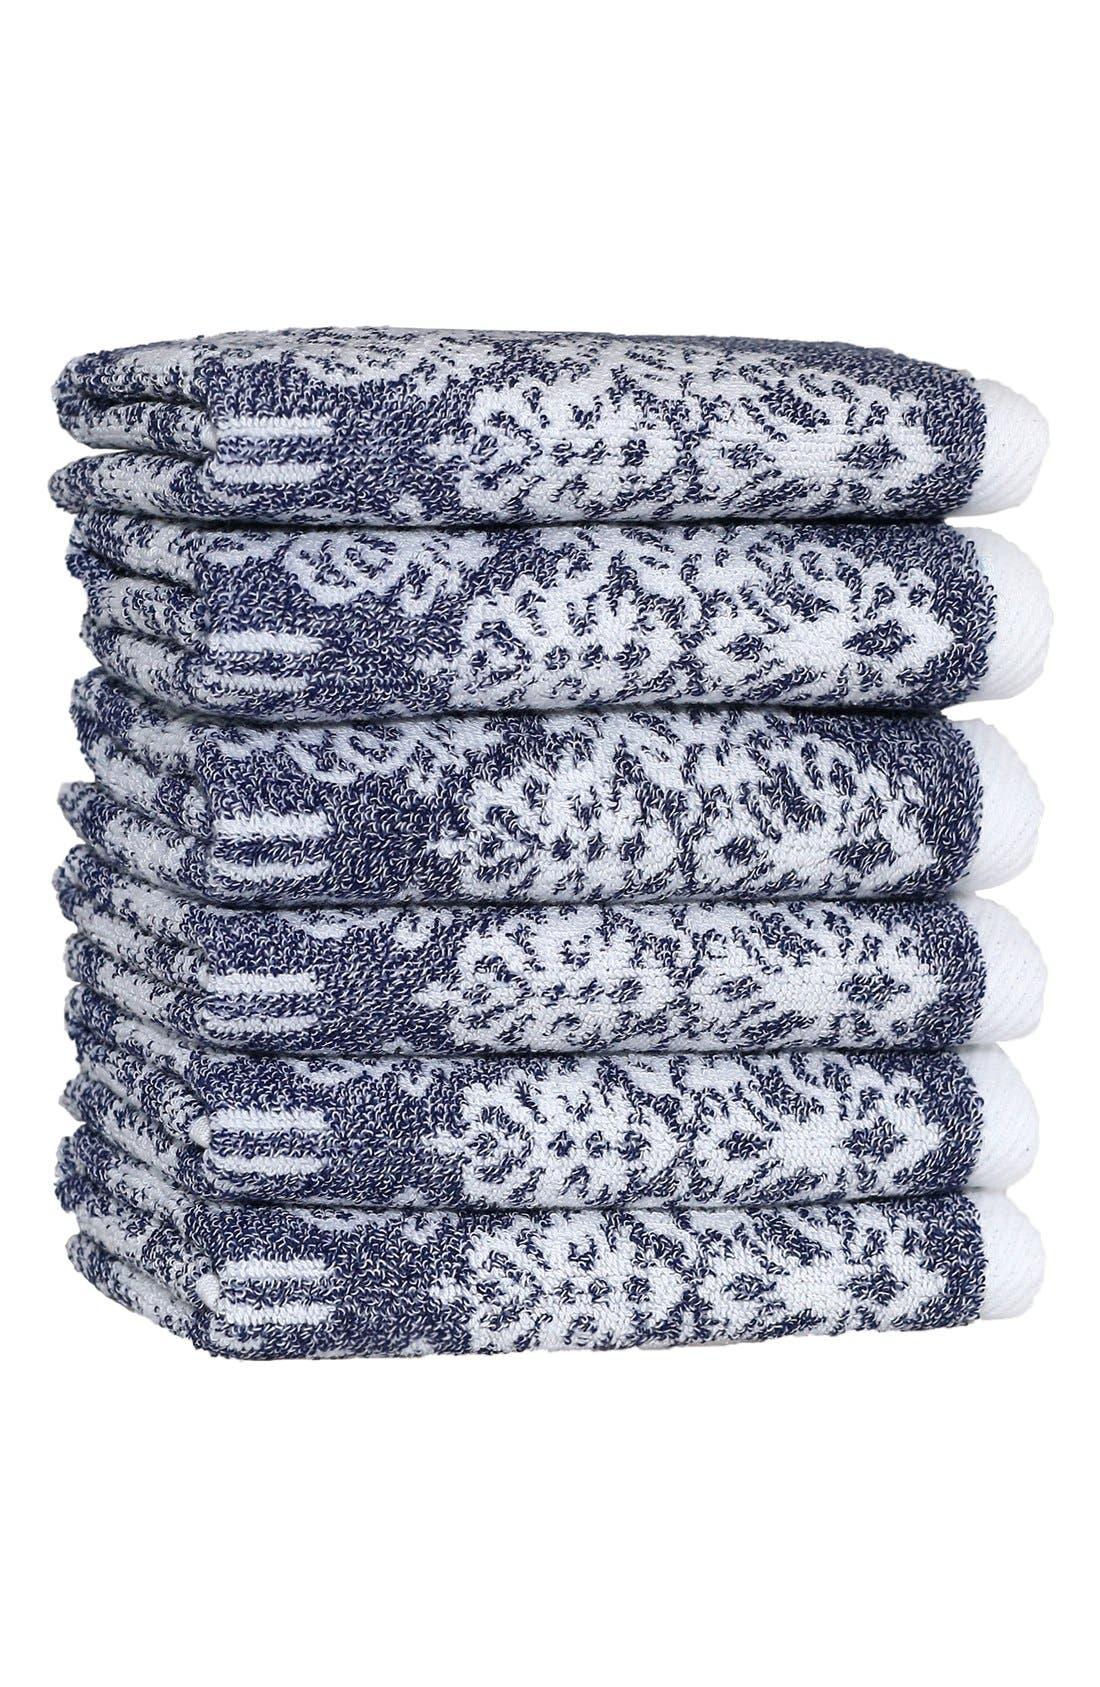 Linum 'Gioia' Turkish Cotton Washcloths (Set of 6)